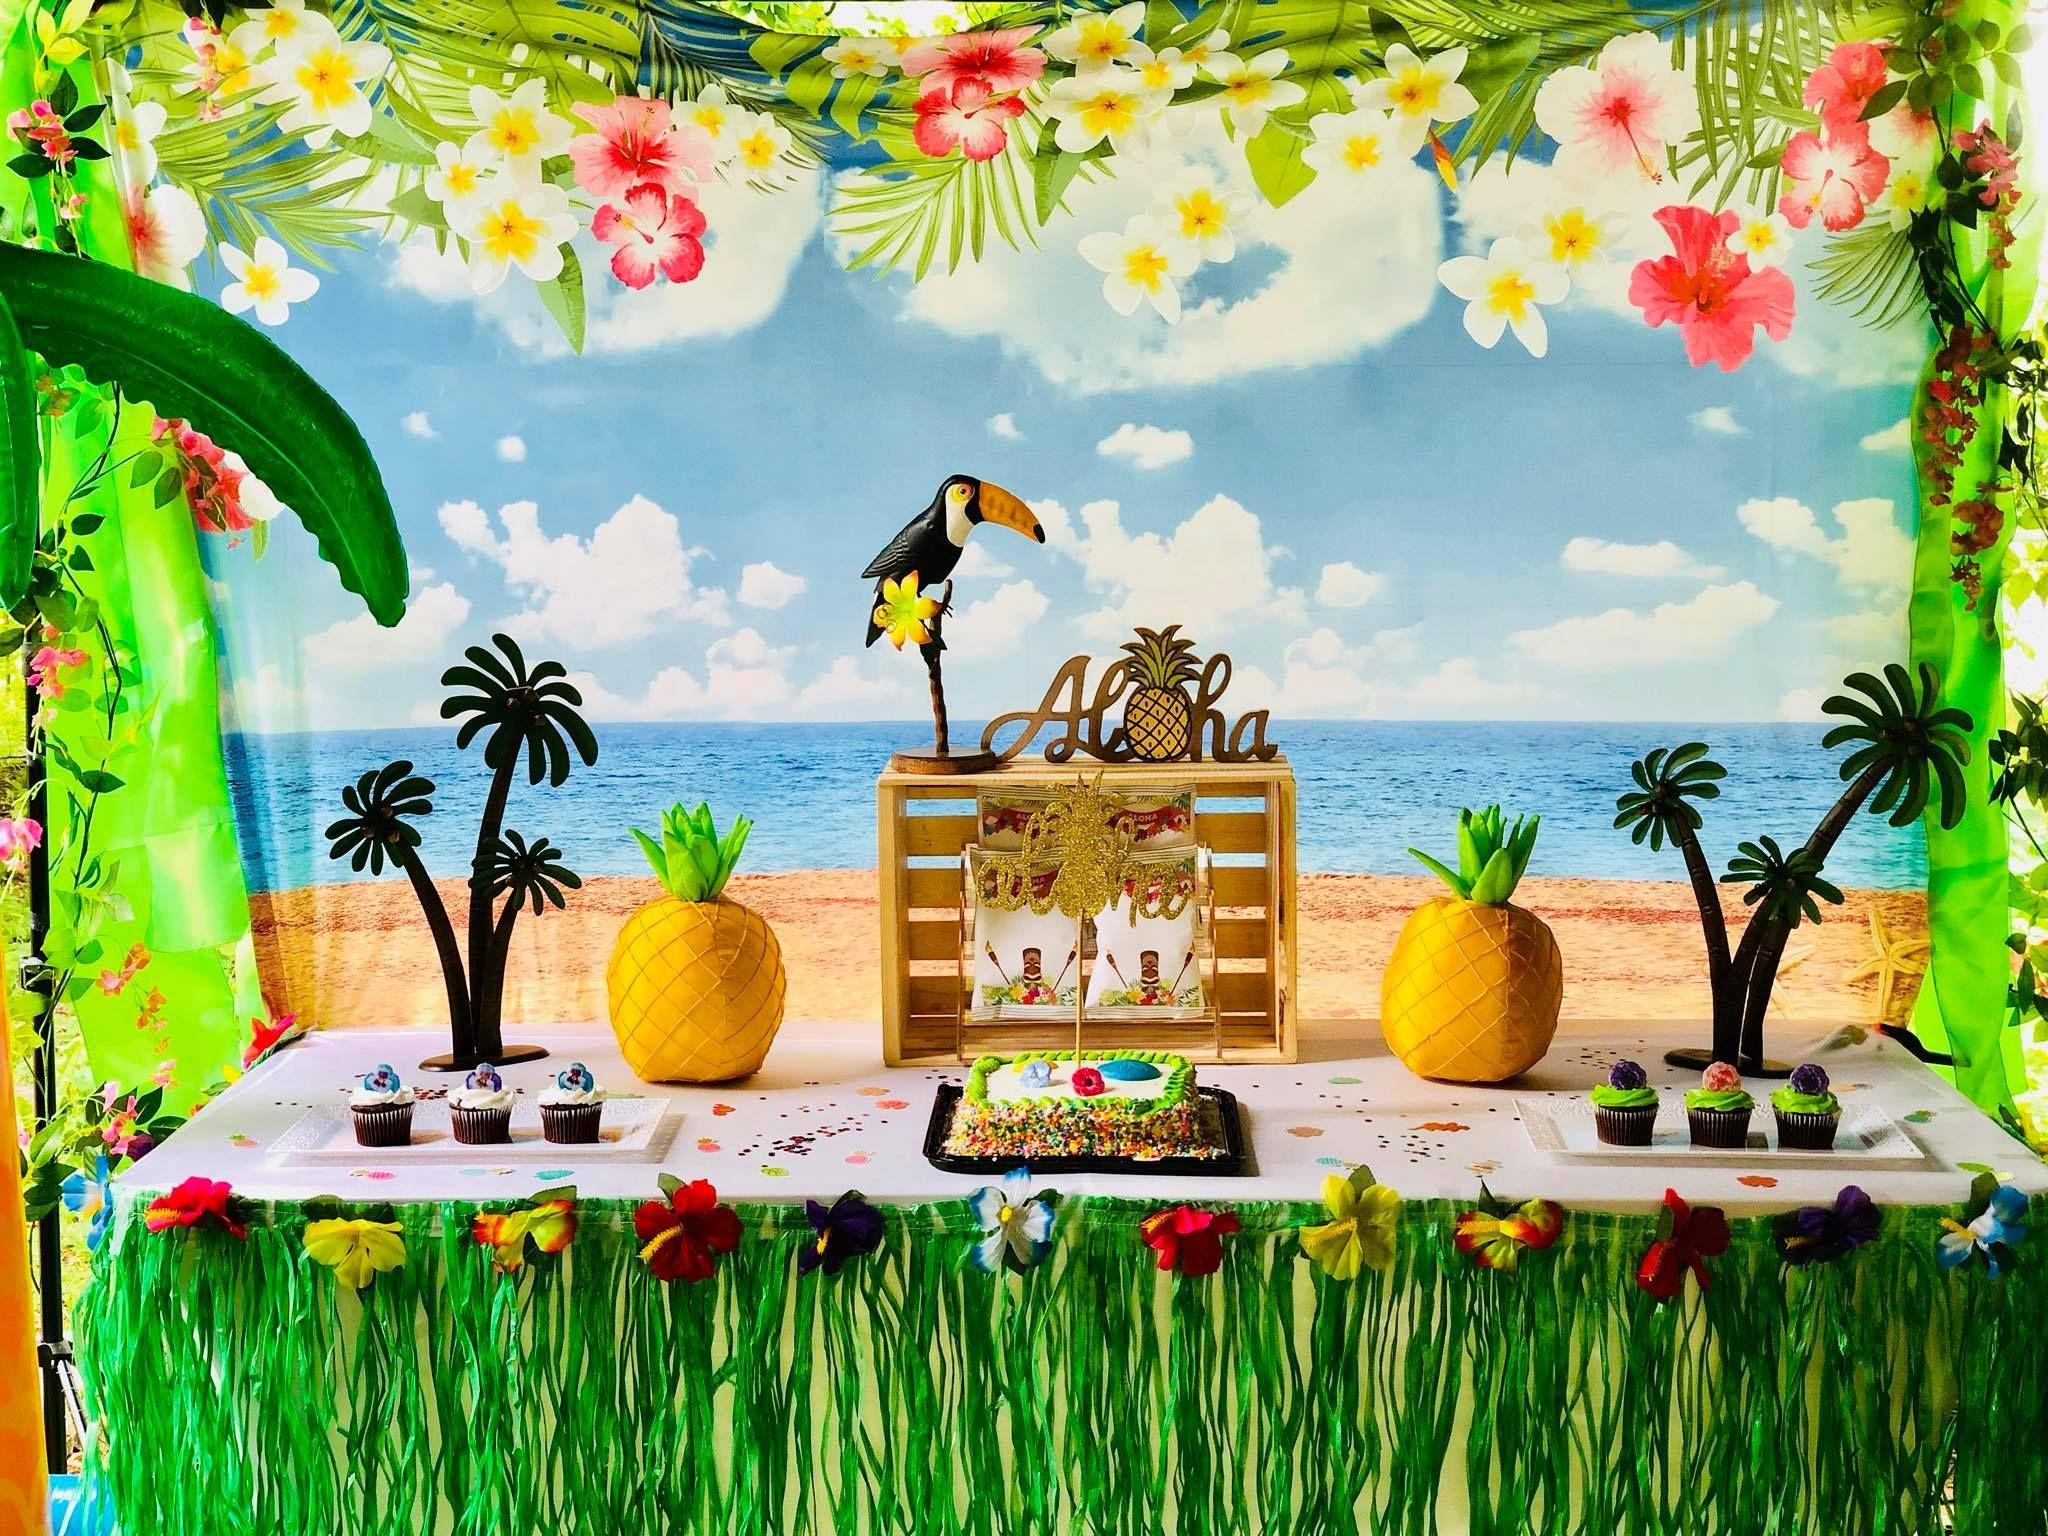 allenjoy 7x5ft moana themed backdrop photography backdrops tropical